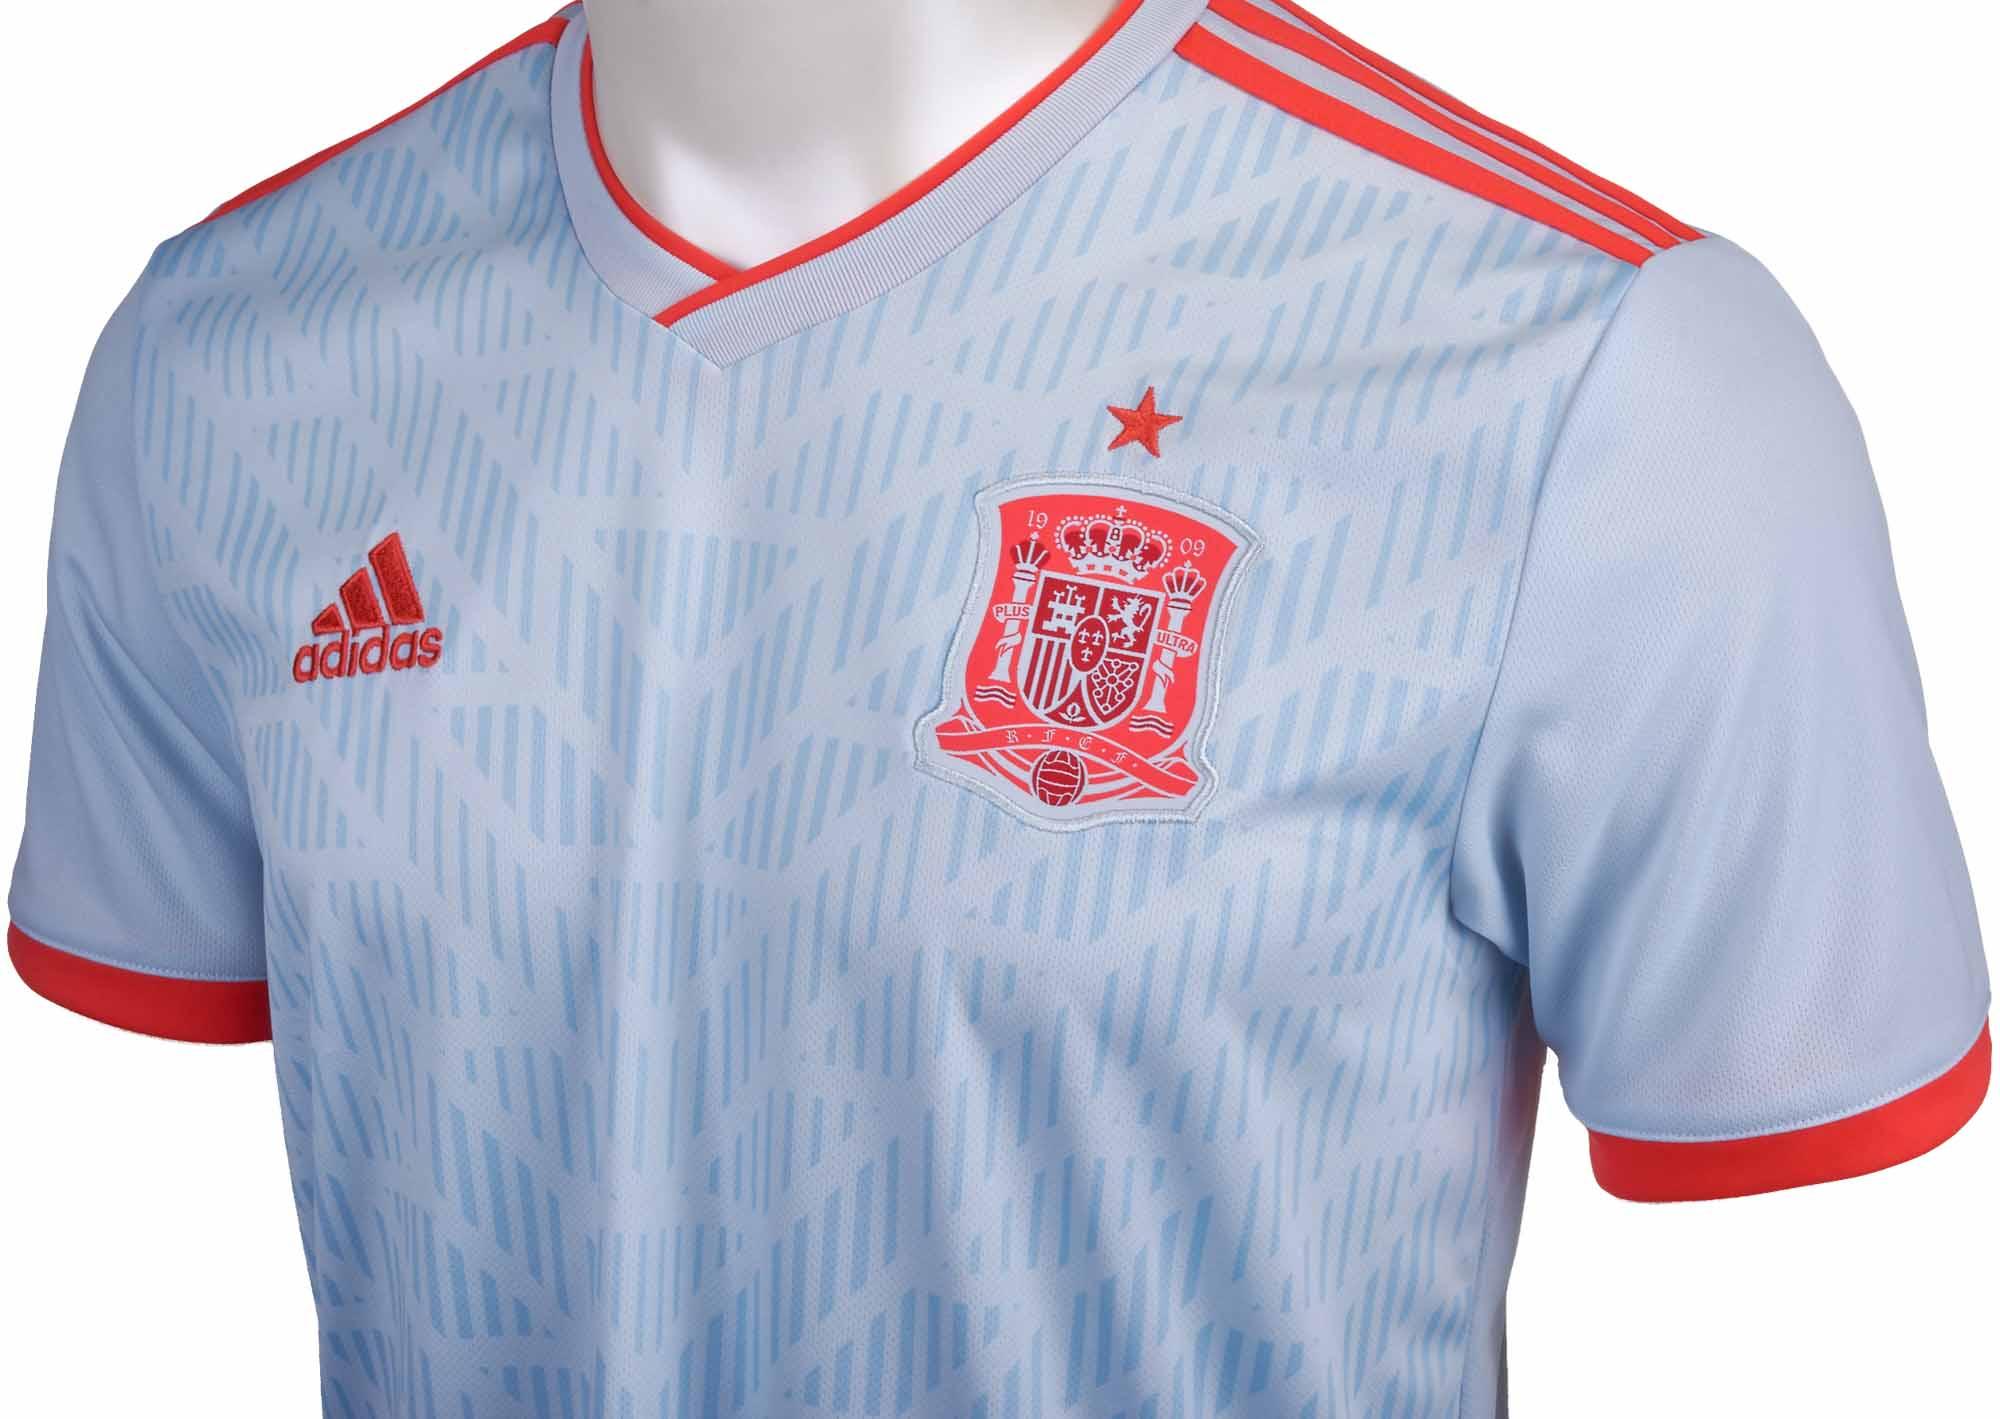 adidas Spain Away Jersey 2018-19 - SoccerPro.com 2283e5f34